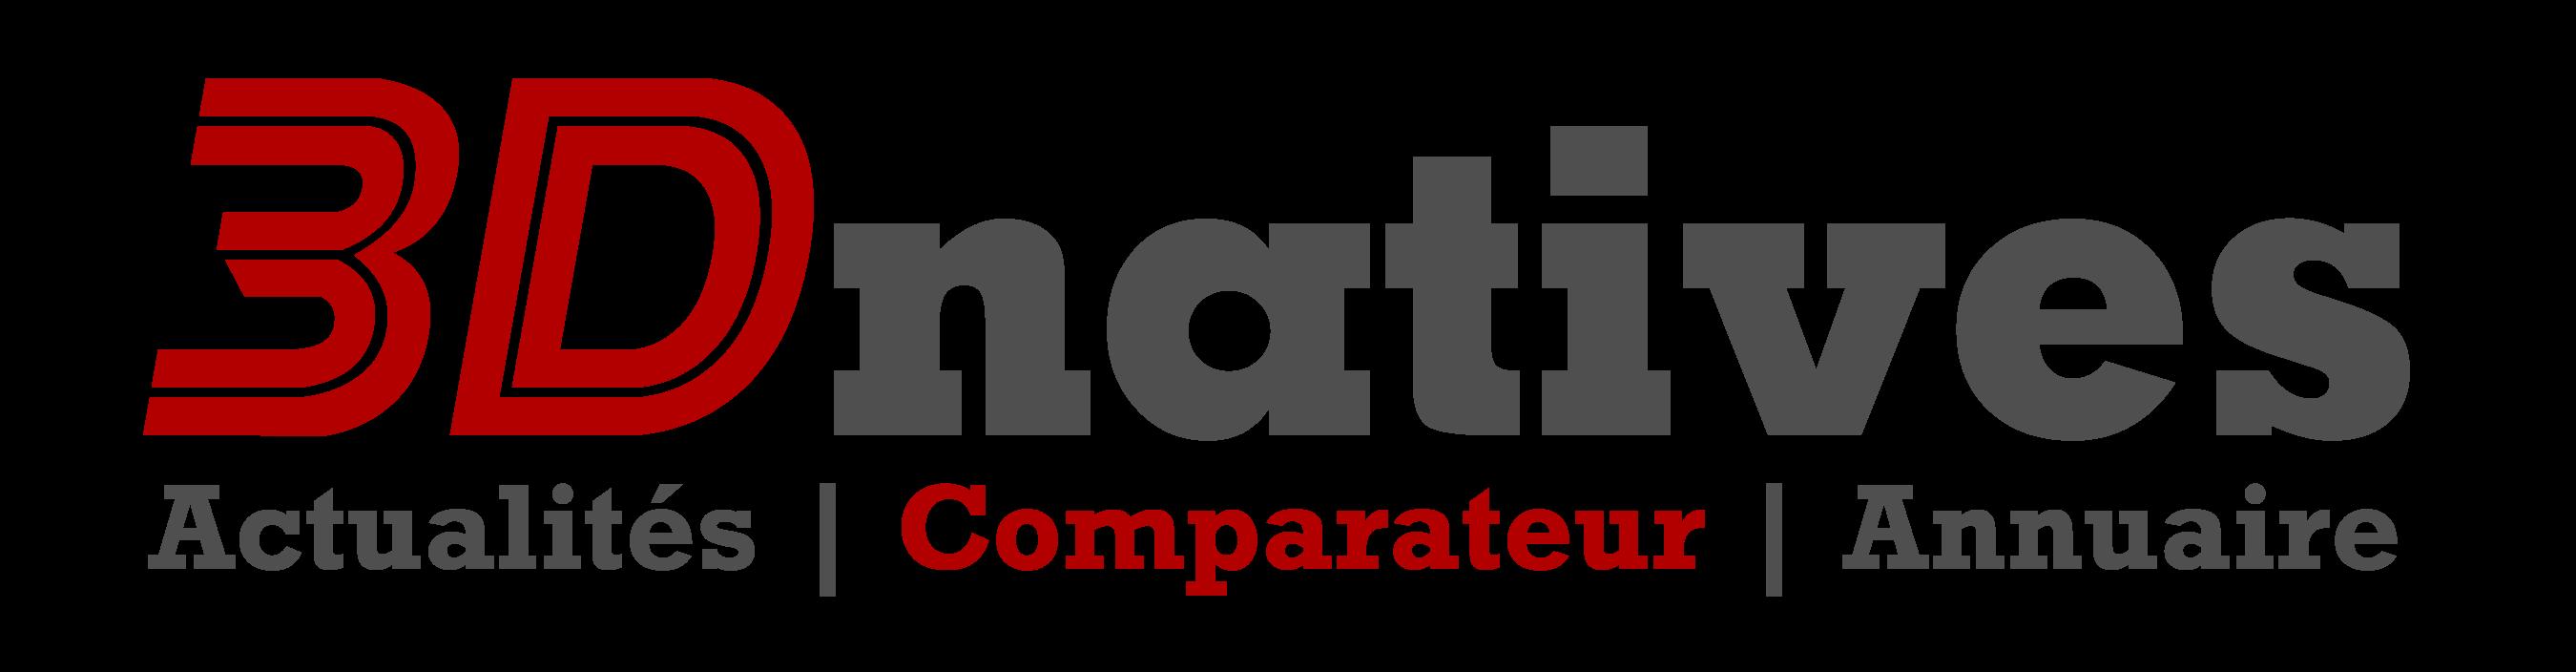 Addditive partenaire 3DNATIVES